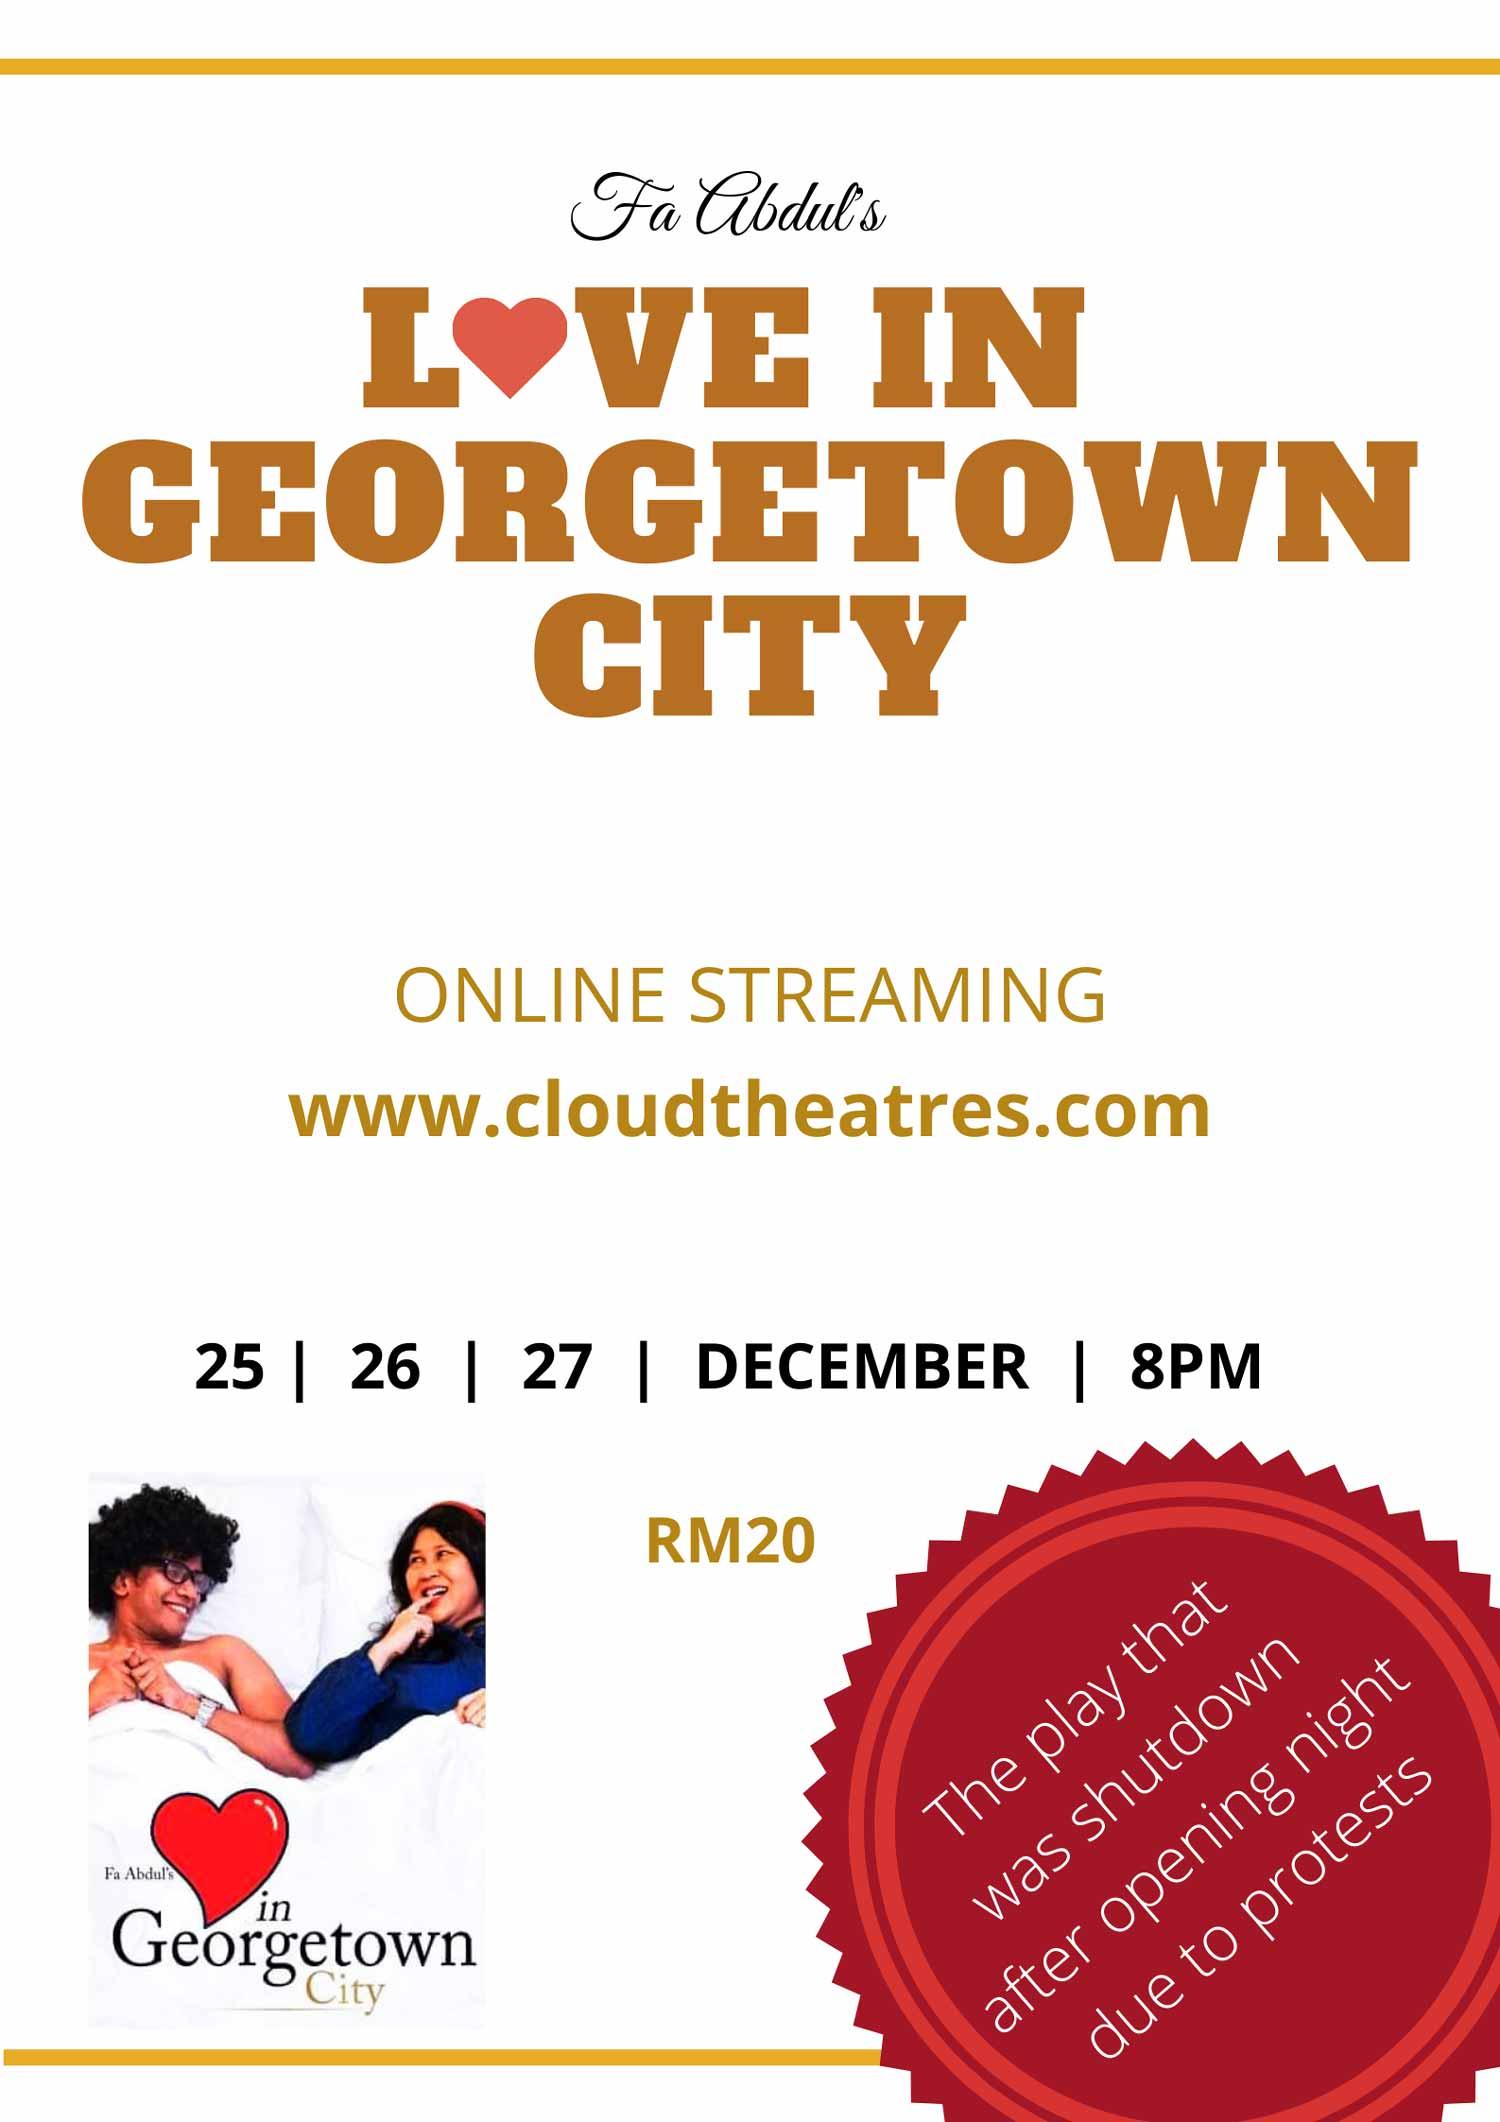 Love in Georgetown City